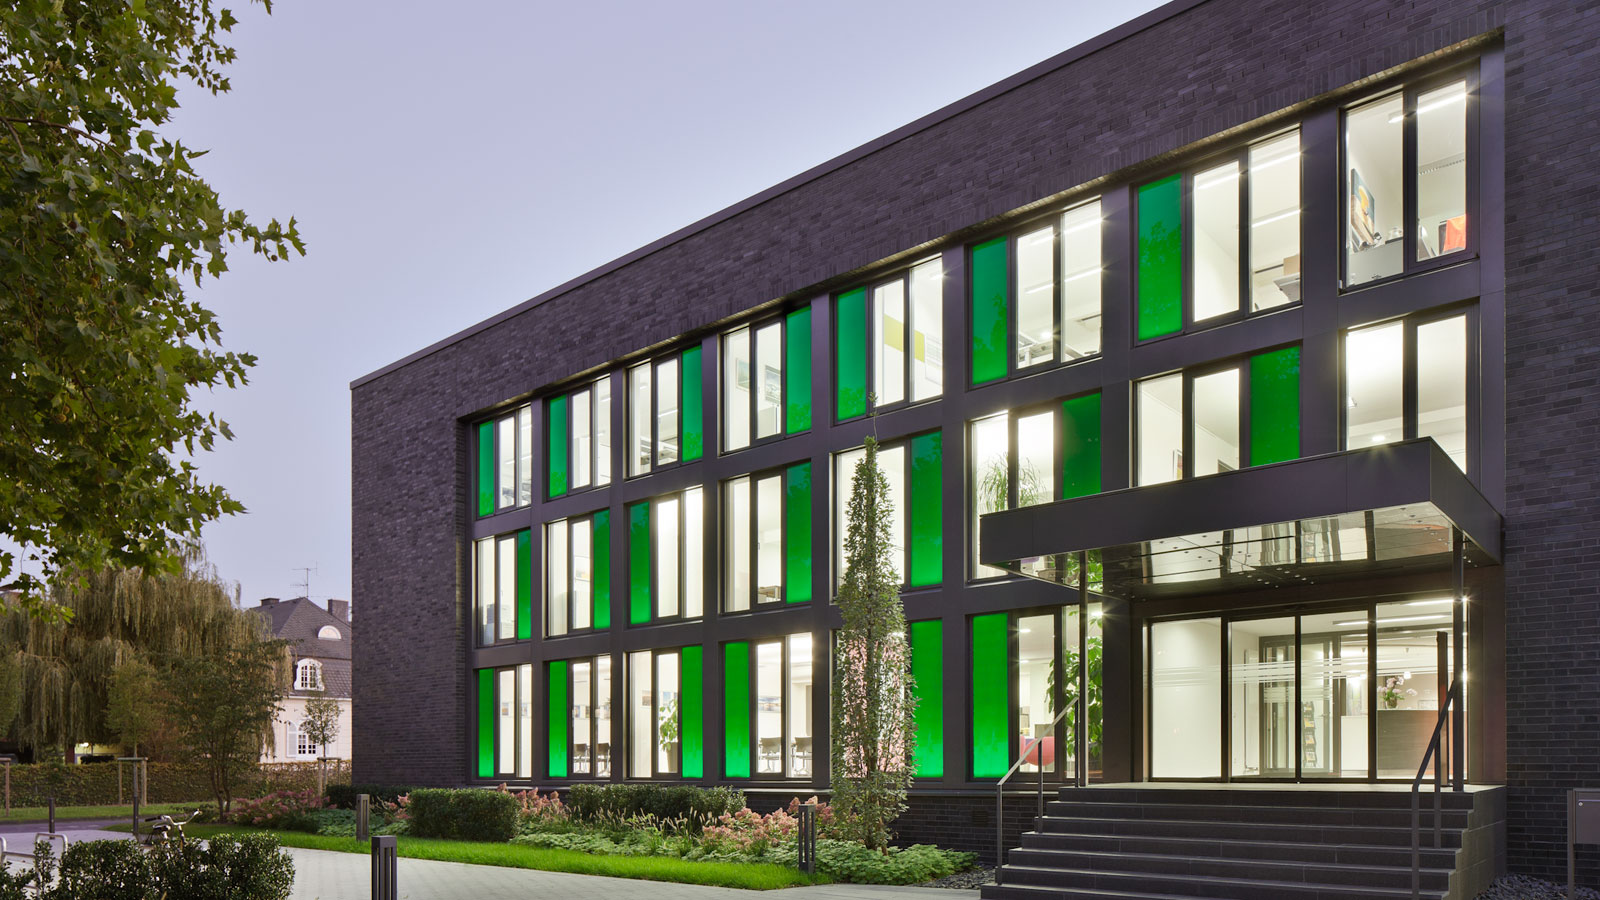 Bürogebäude Godesberger Allee